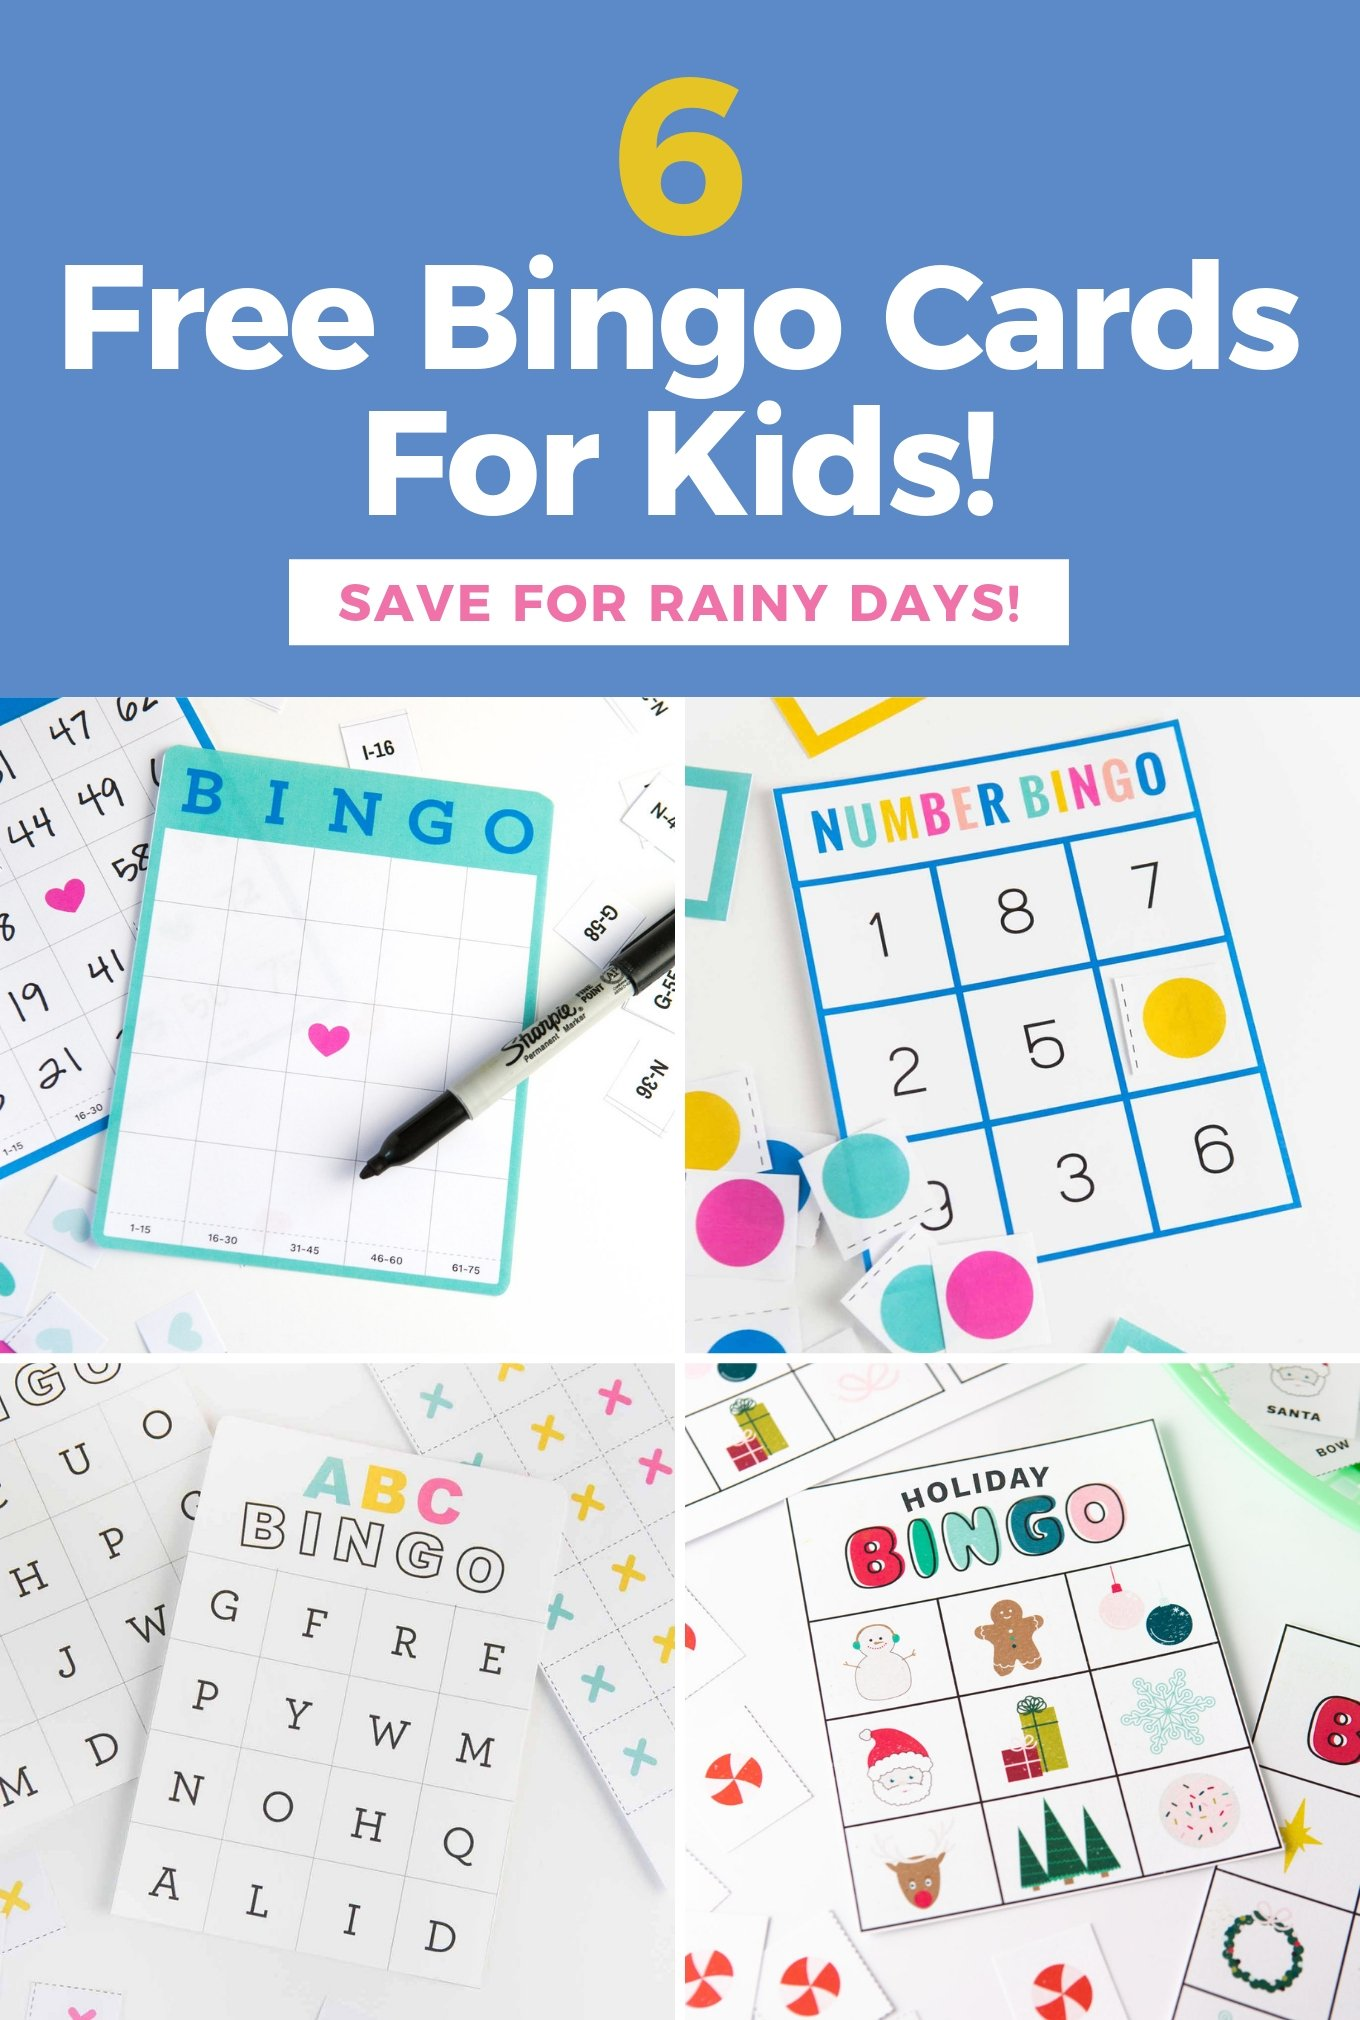 6 Free Bingo Cards for Kids